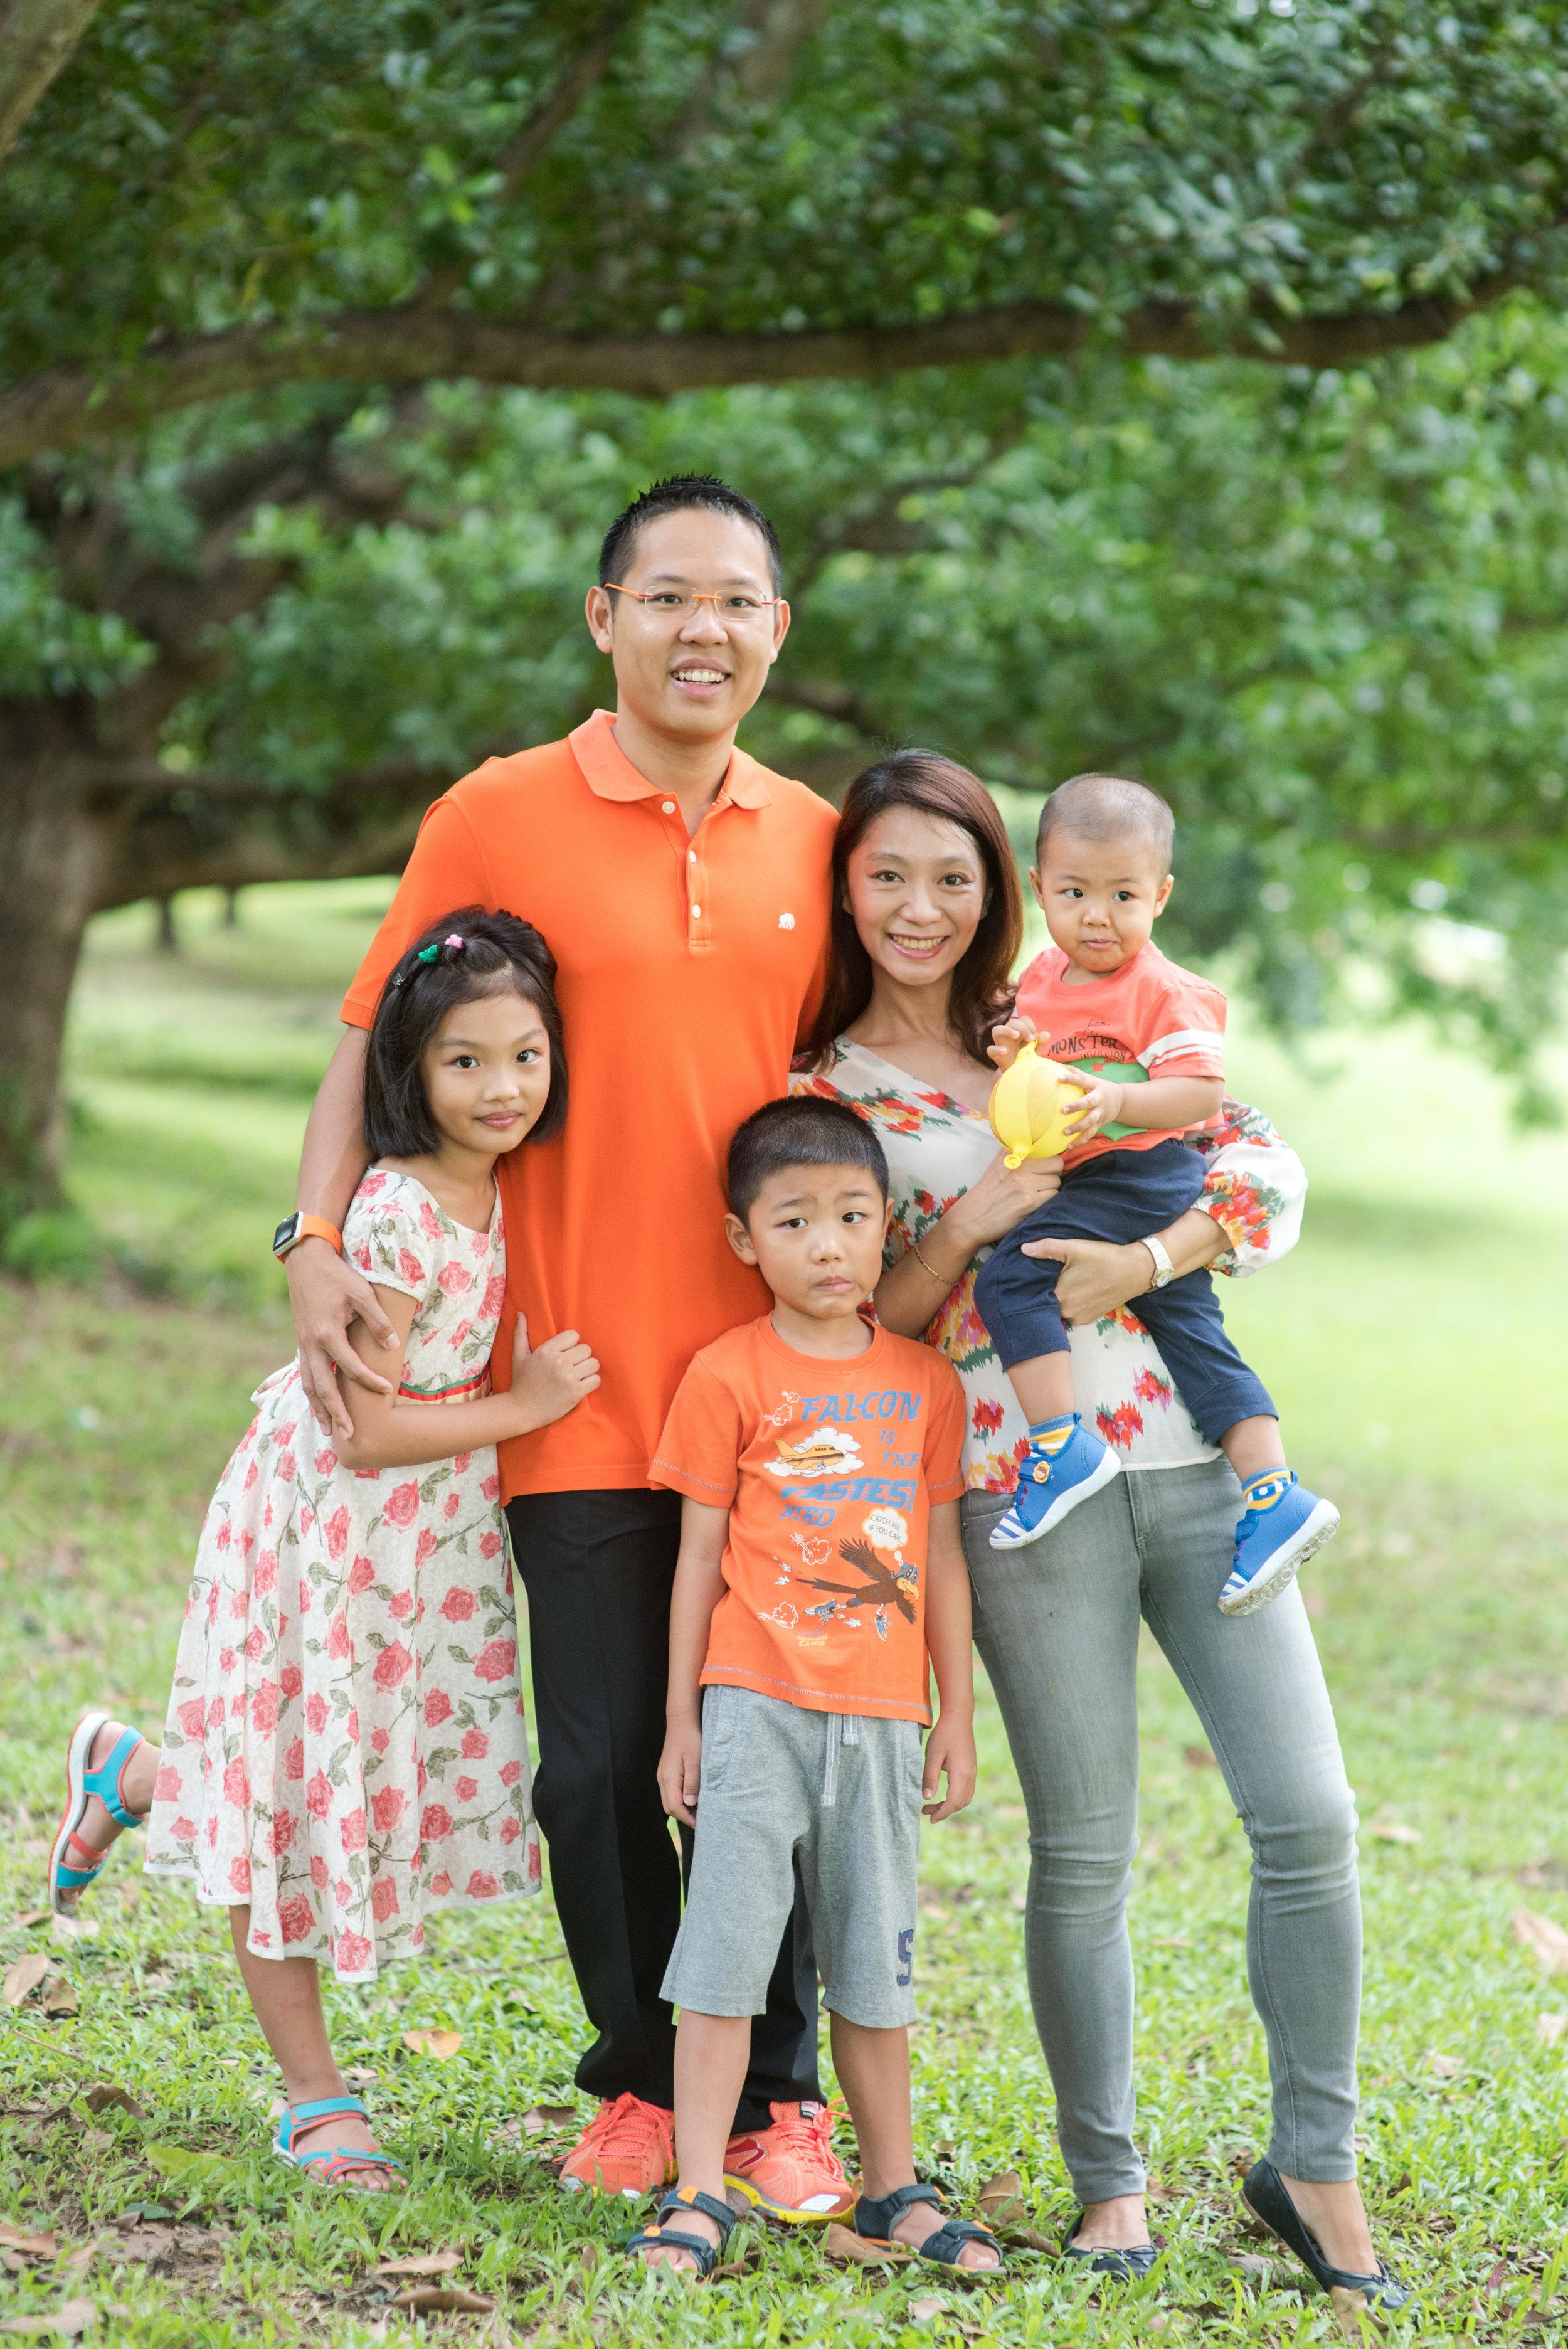 ang-mo-kio-park-family-01